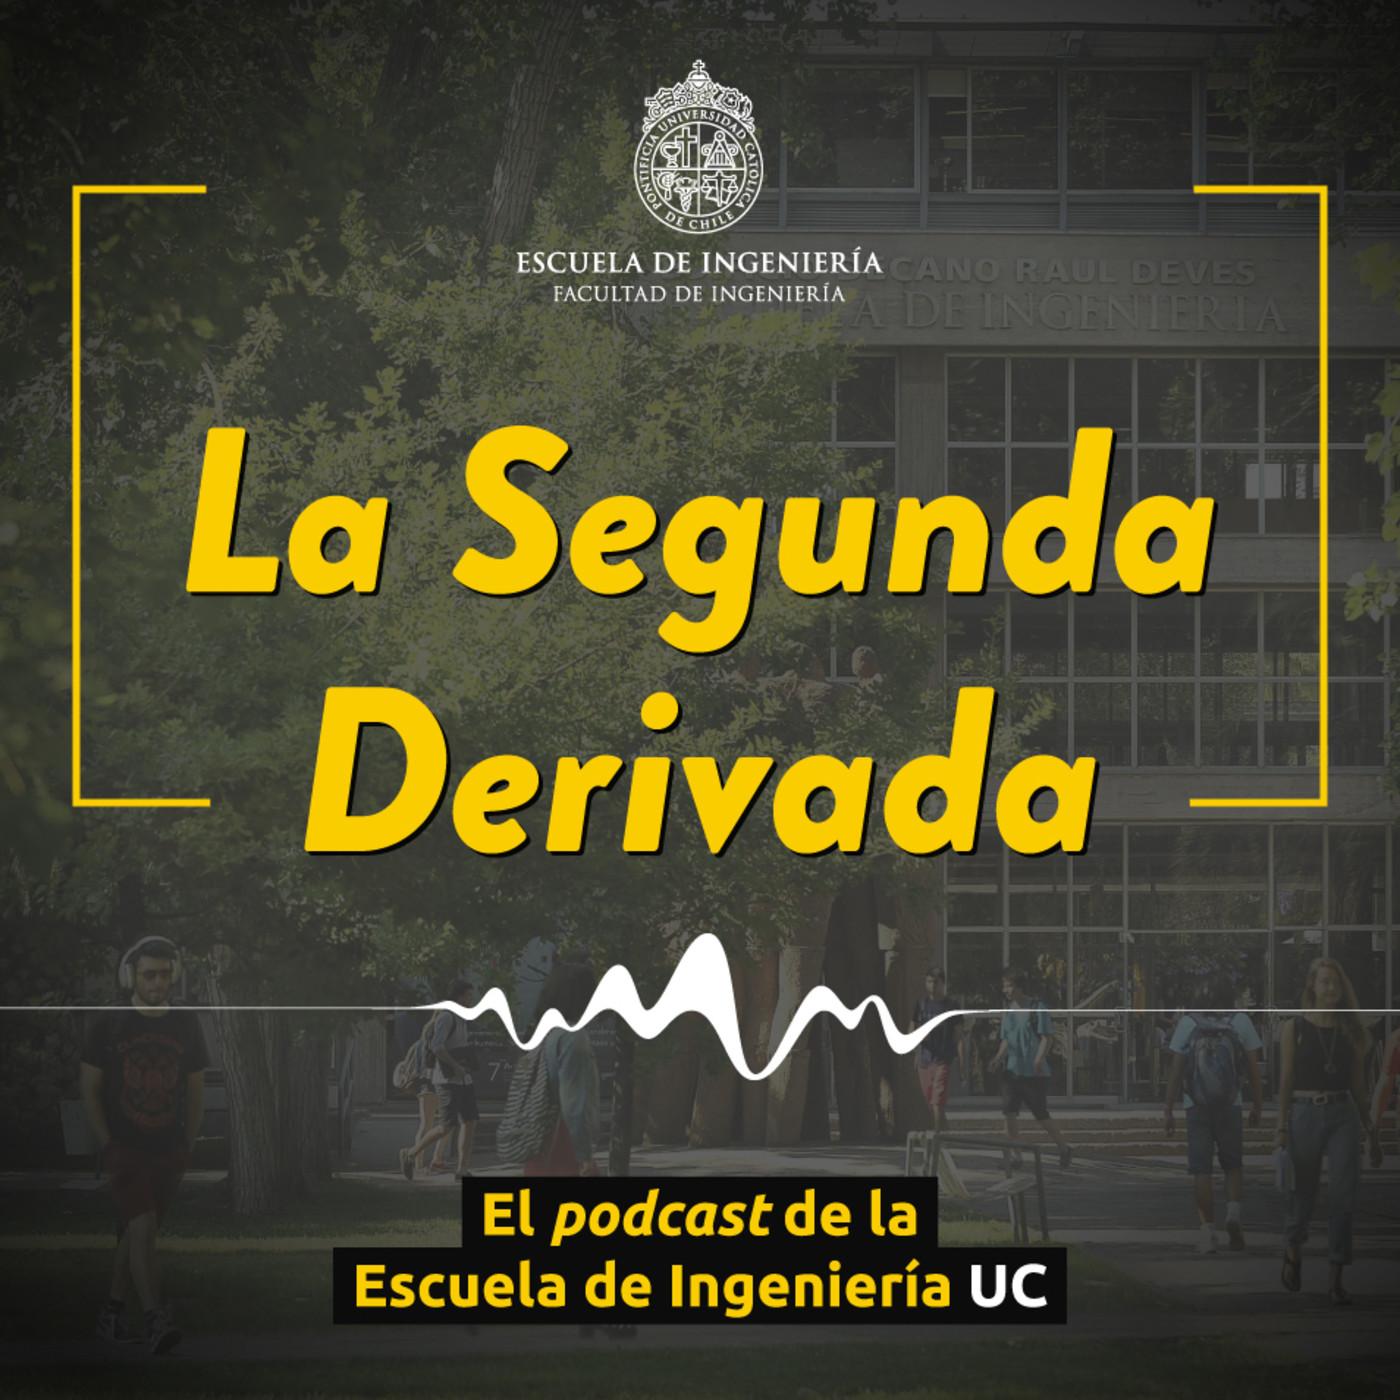 COVID-19: Una manufactura mecánica busca ayudar a combatir la pandemia| Profesor Felipe Lechuga